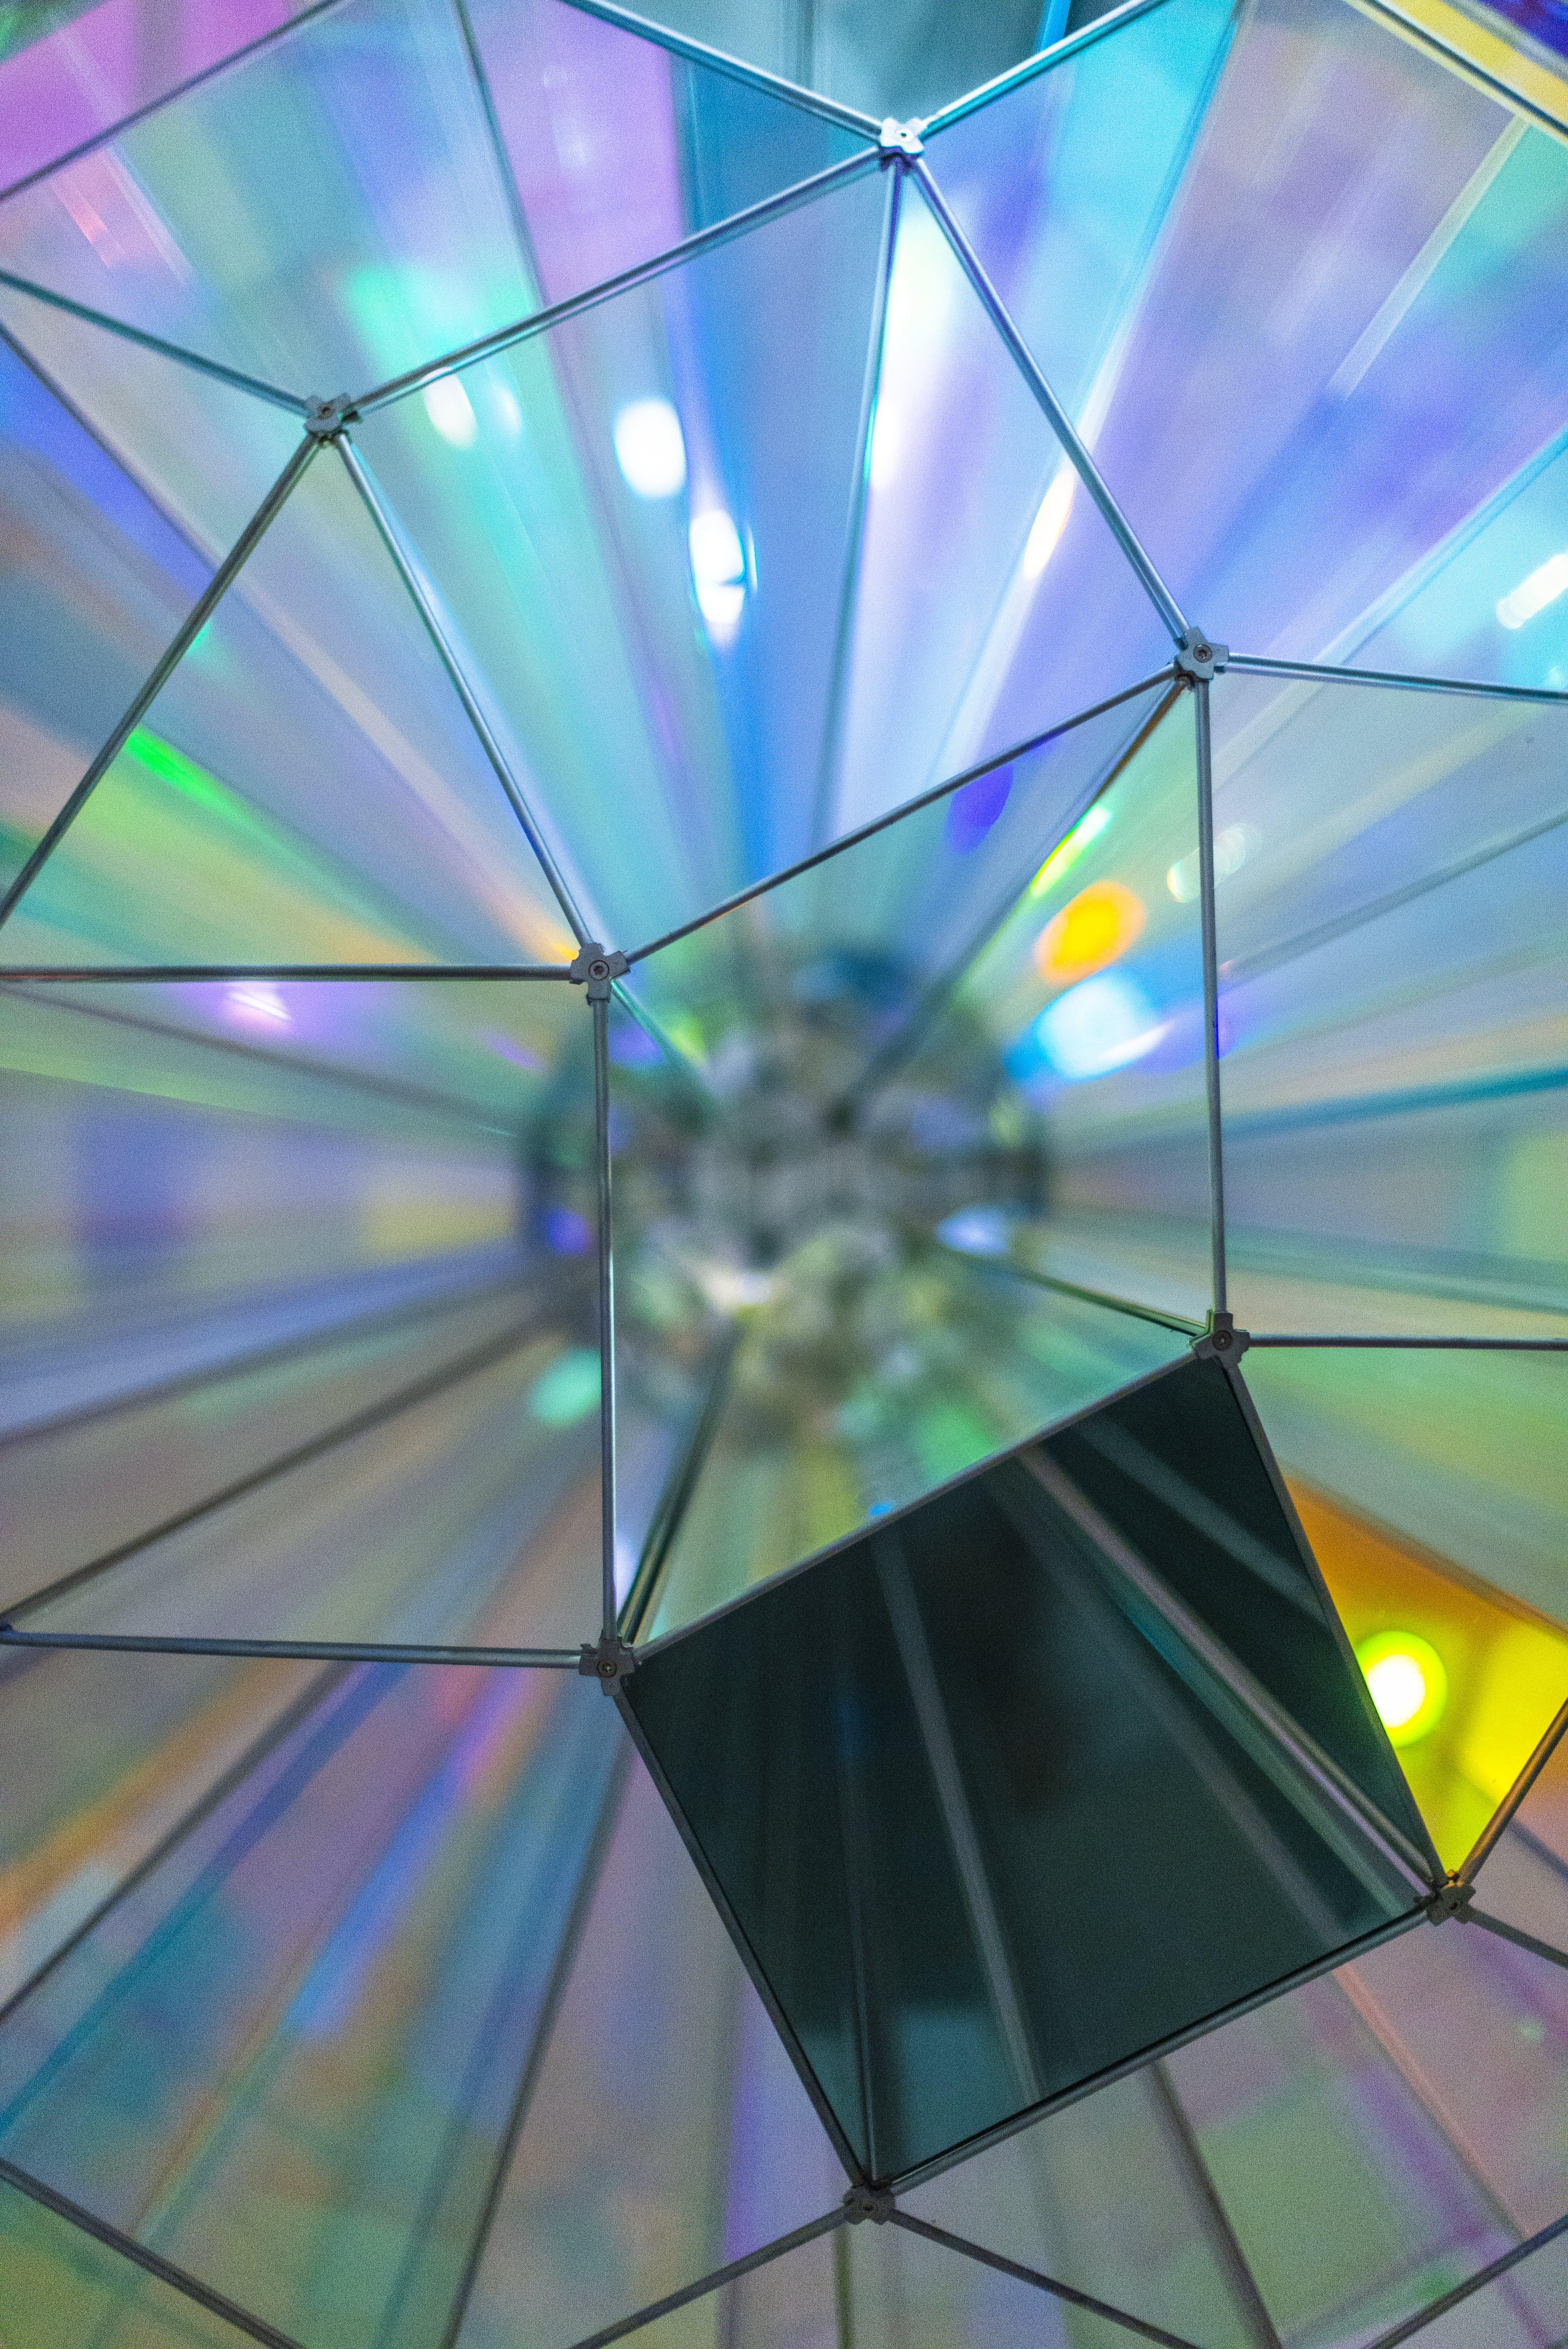 glare, glass, light reflections